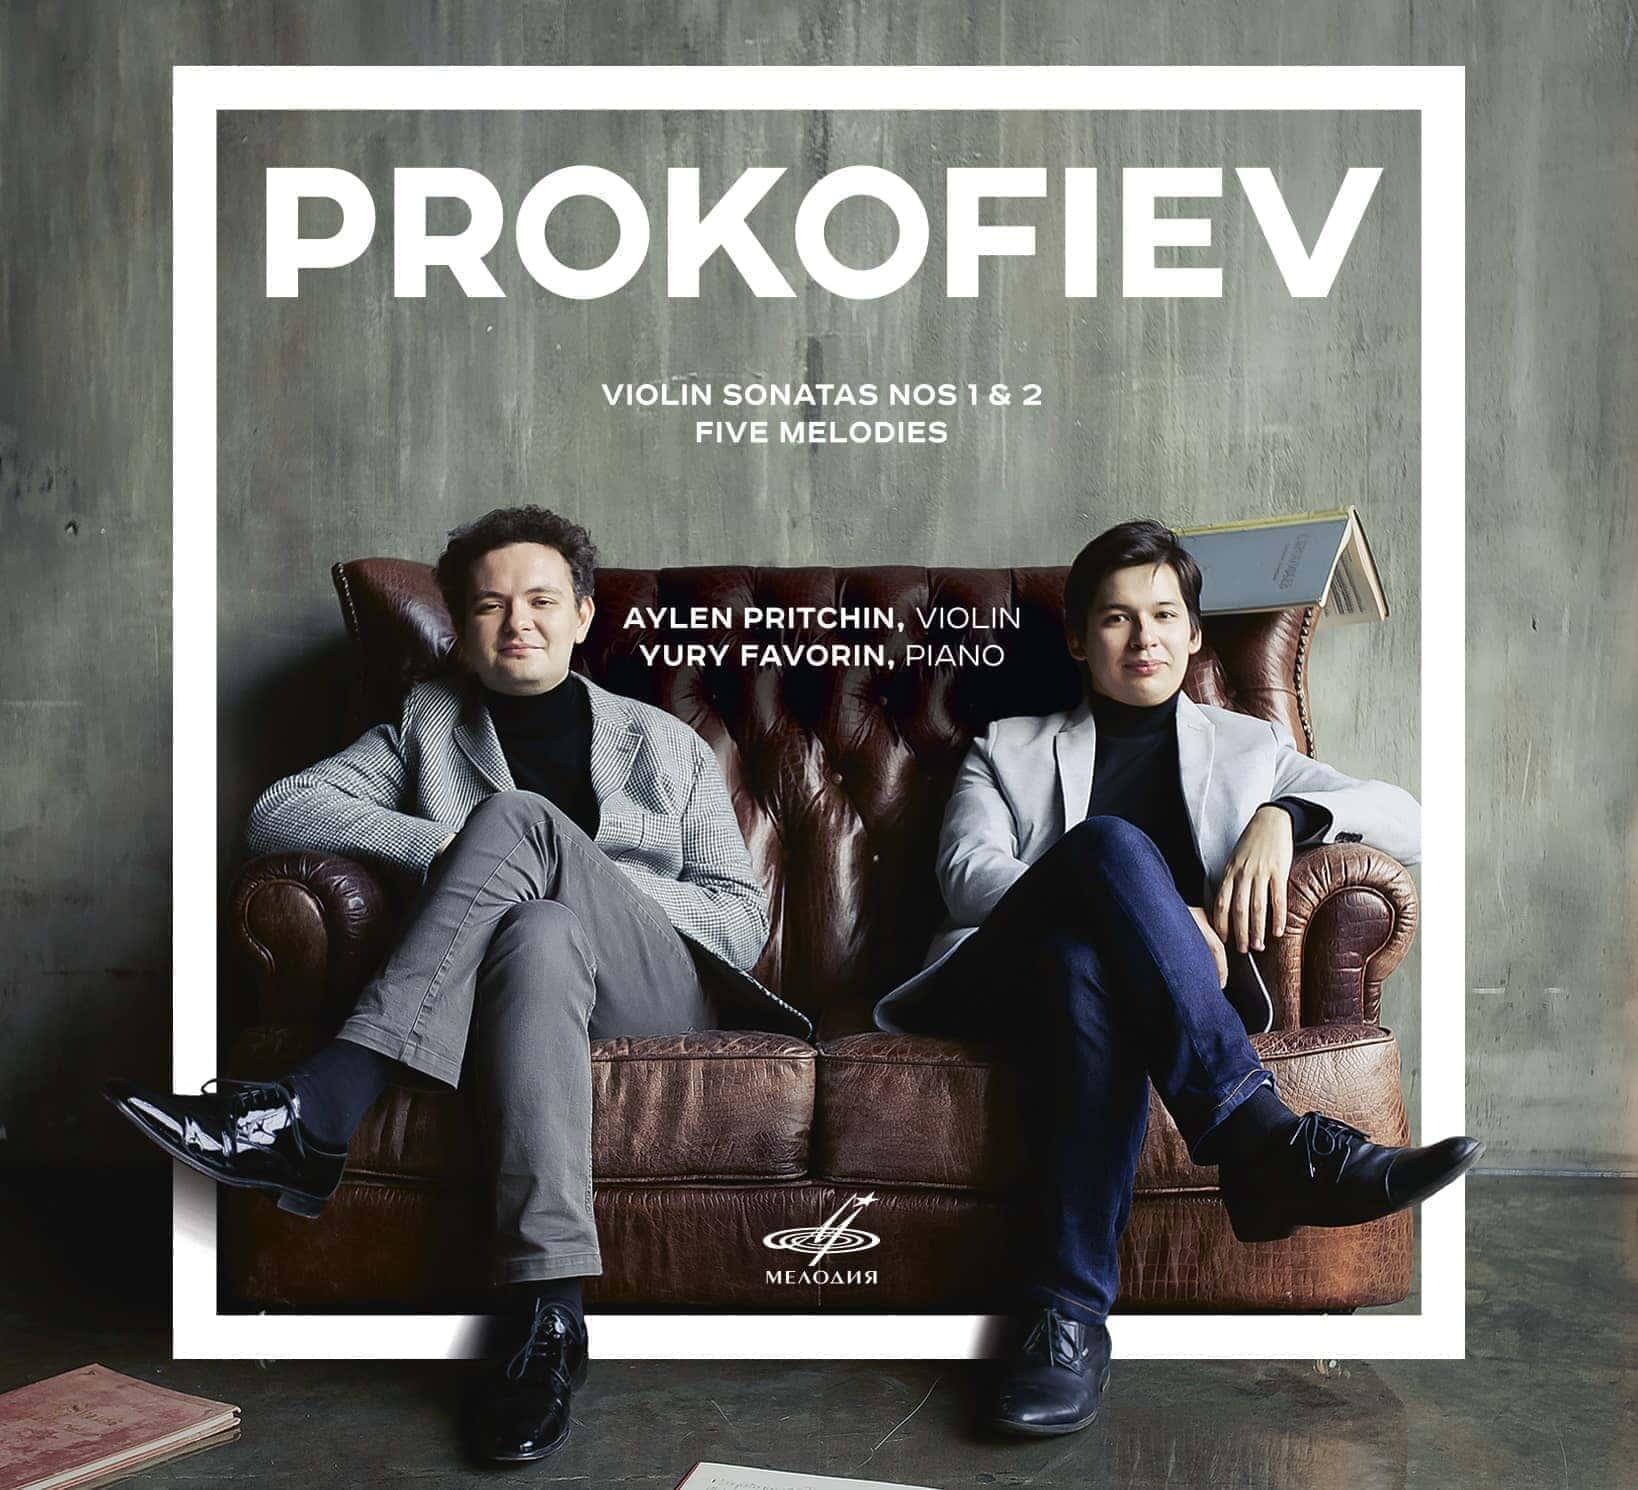 Айлен Притчин, Юрий Фаворин. «Prokofiev»